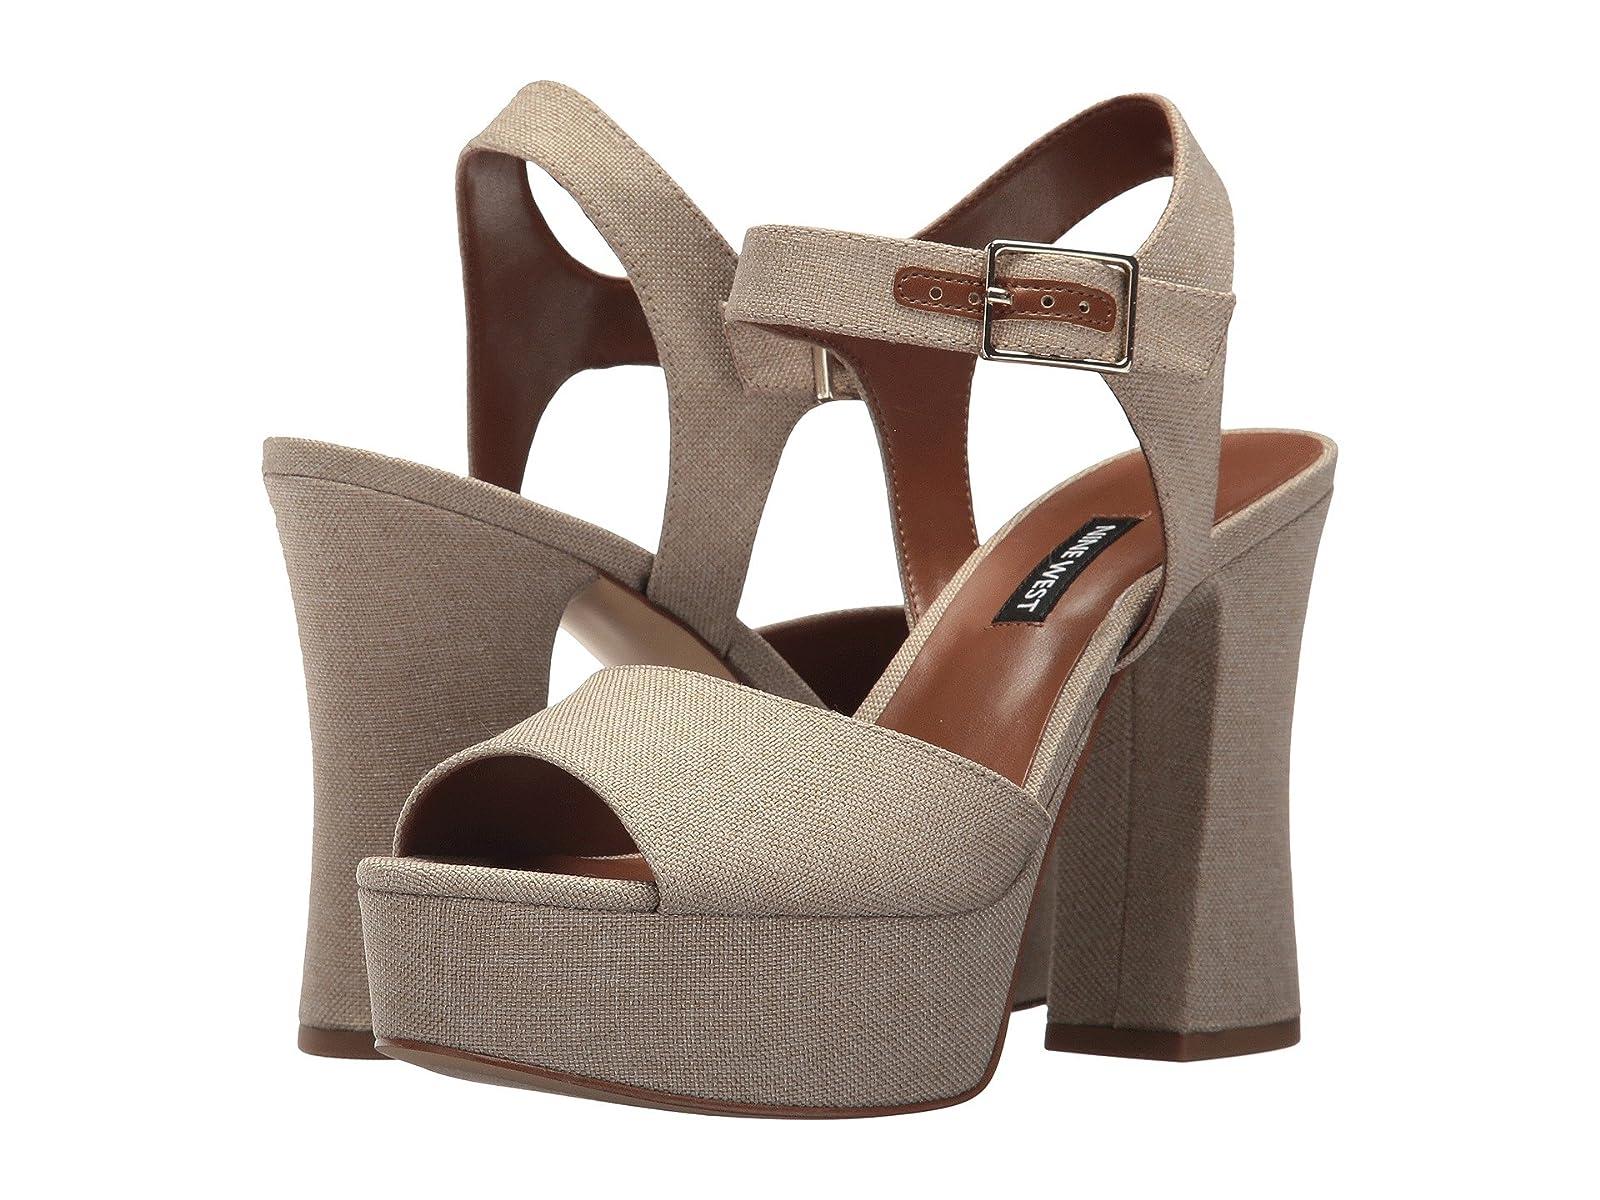 Nine West Wilmarie Platform Heel SandalCheap and distinctive eye-catching shoes